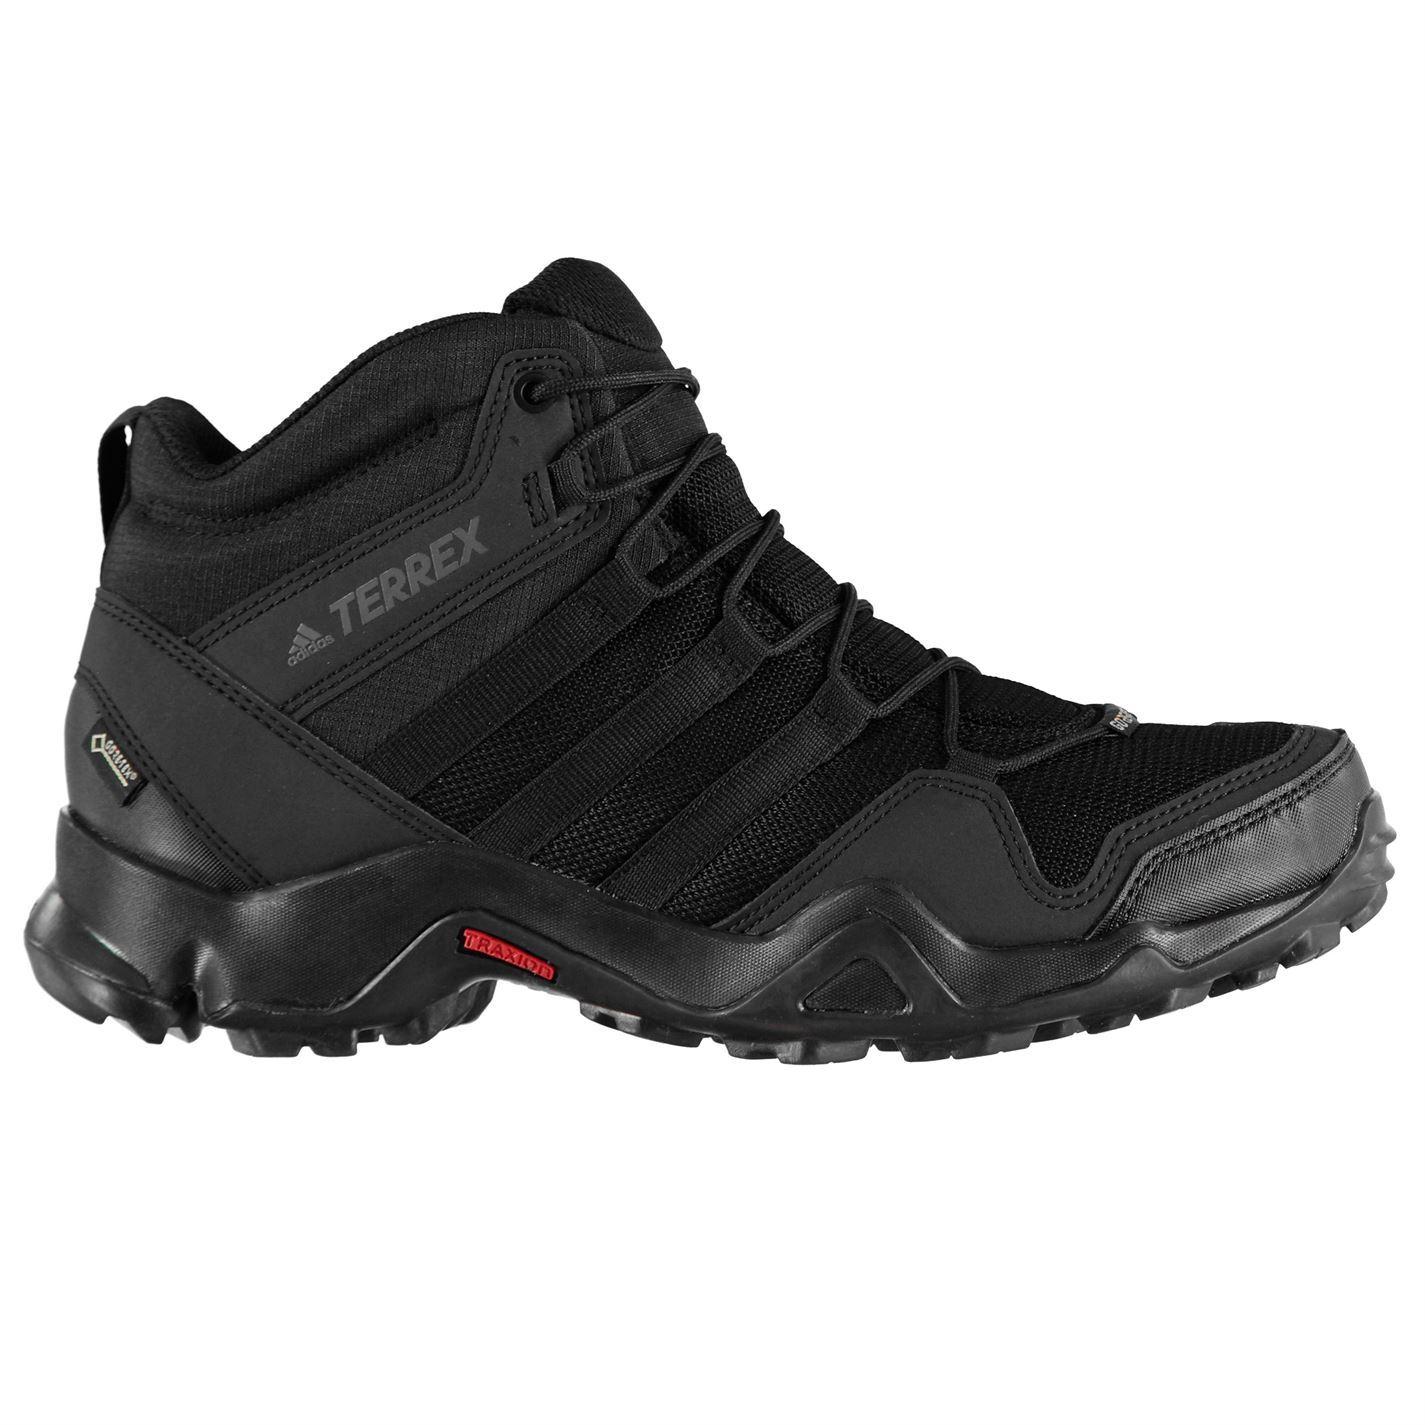 Vendita Scarpe Adidas Terrex Ax2r Mid Gtx Scarpe Trekking